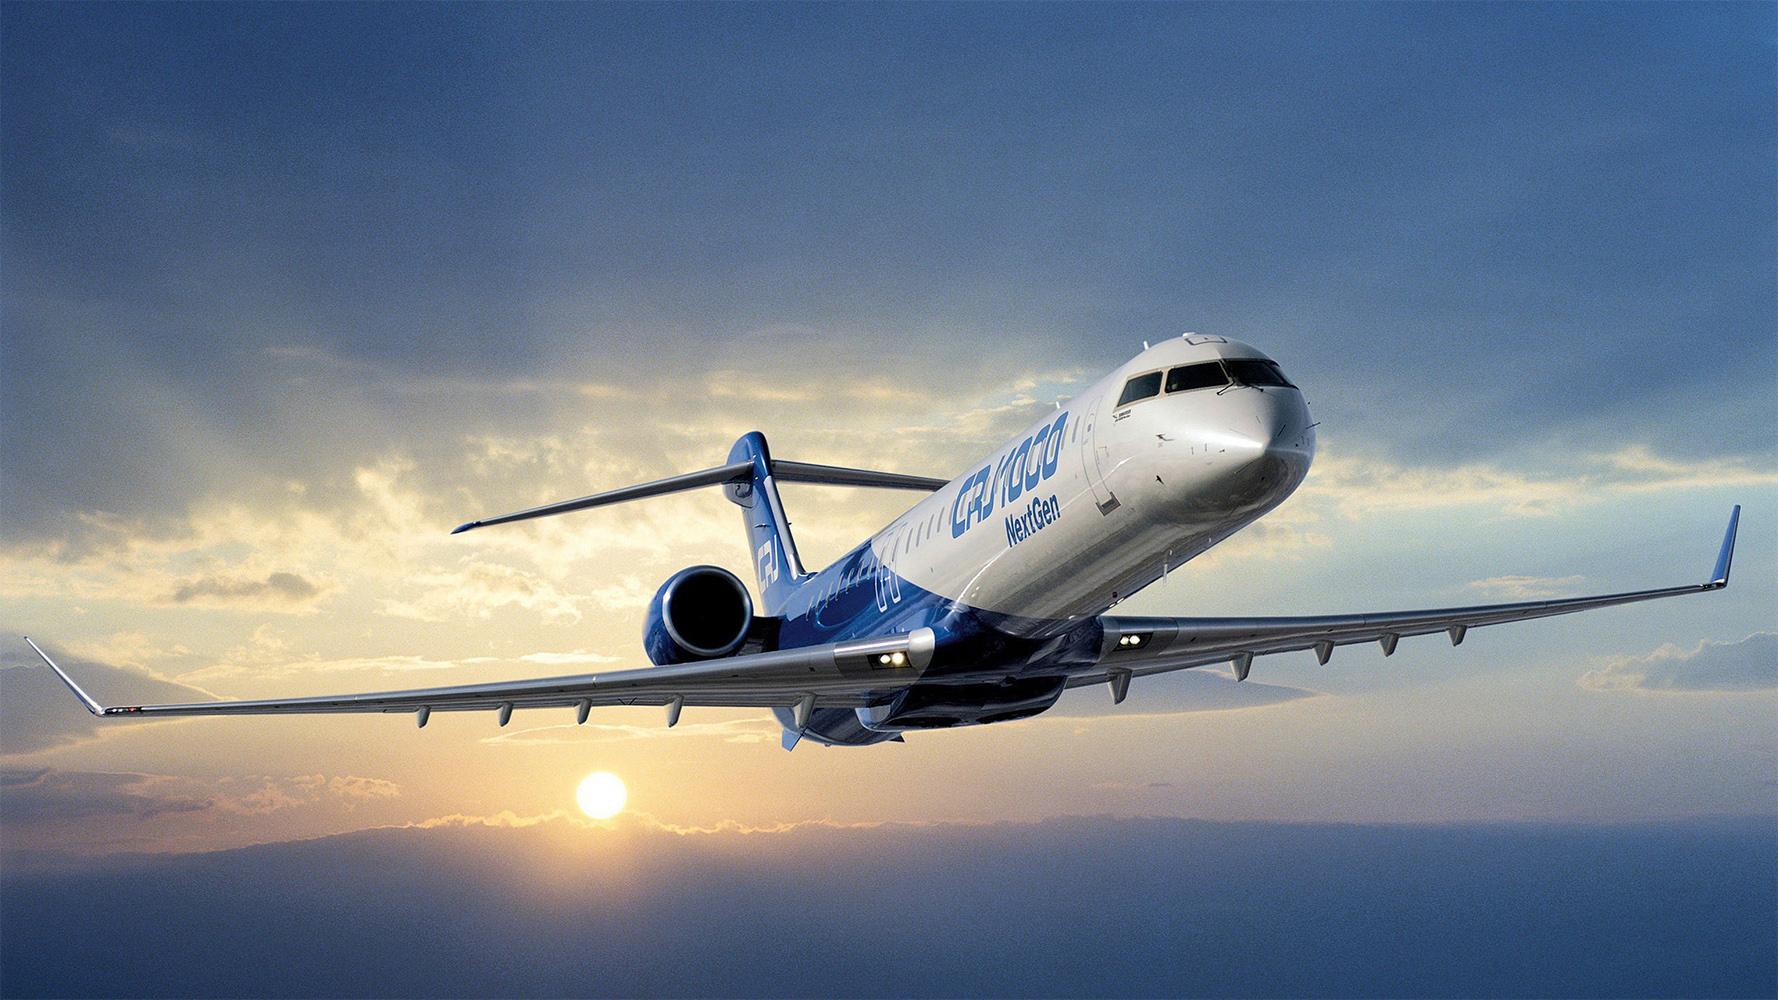 Bombardier CRJ 1000